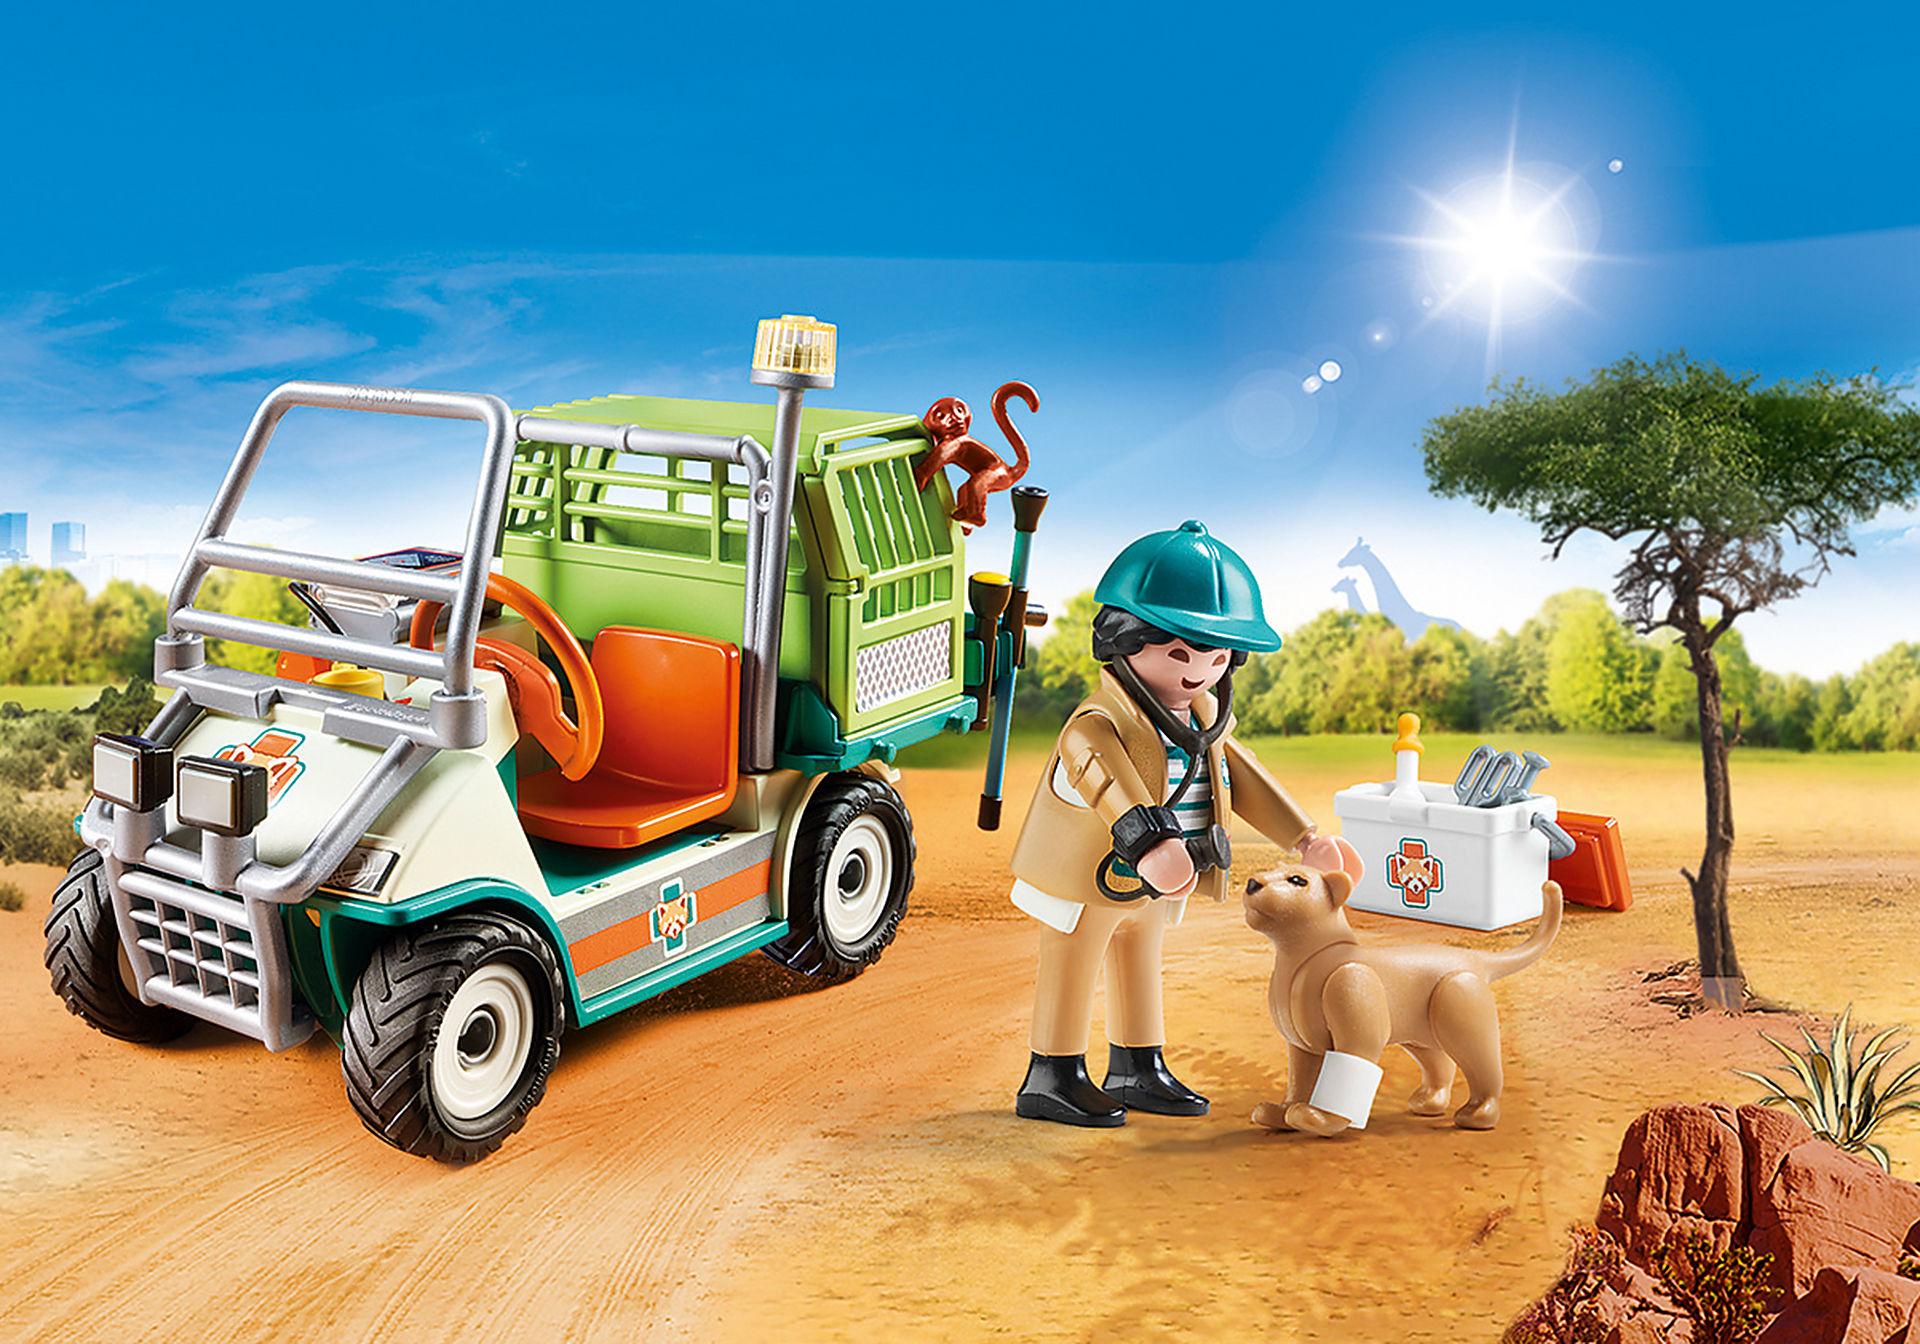 70346 Zoo-Tierarzt mit Fahrzeug zoom image1